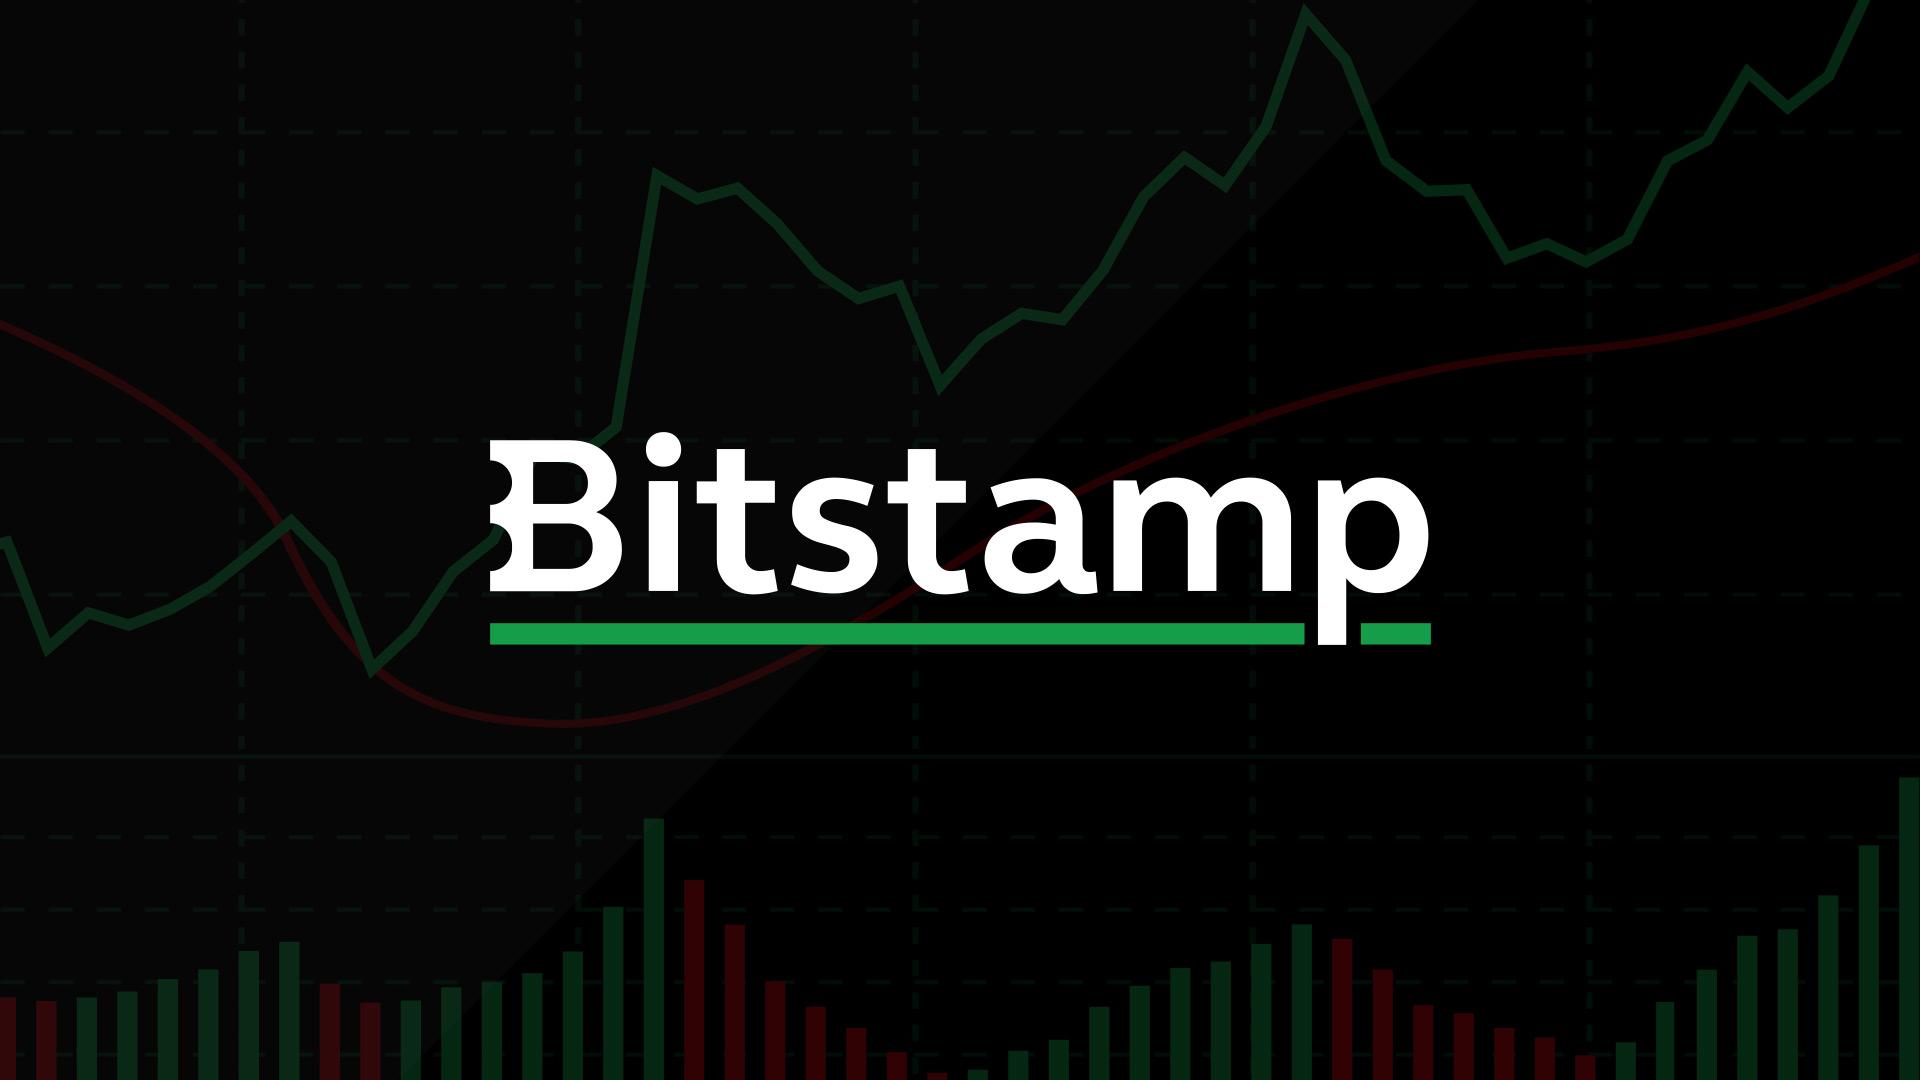 Bitstamp owner fires back at former CEO in court clash over shares